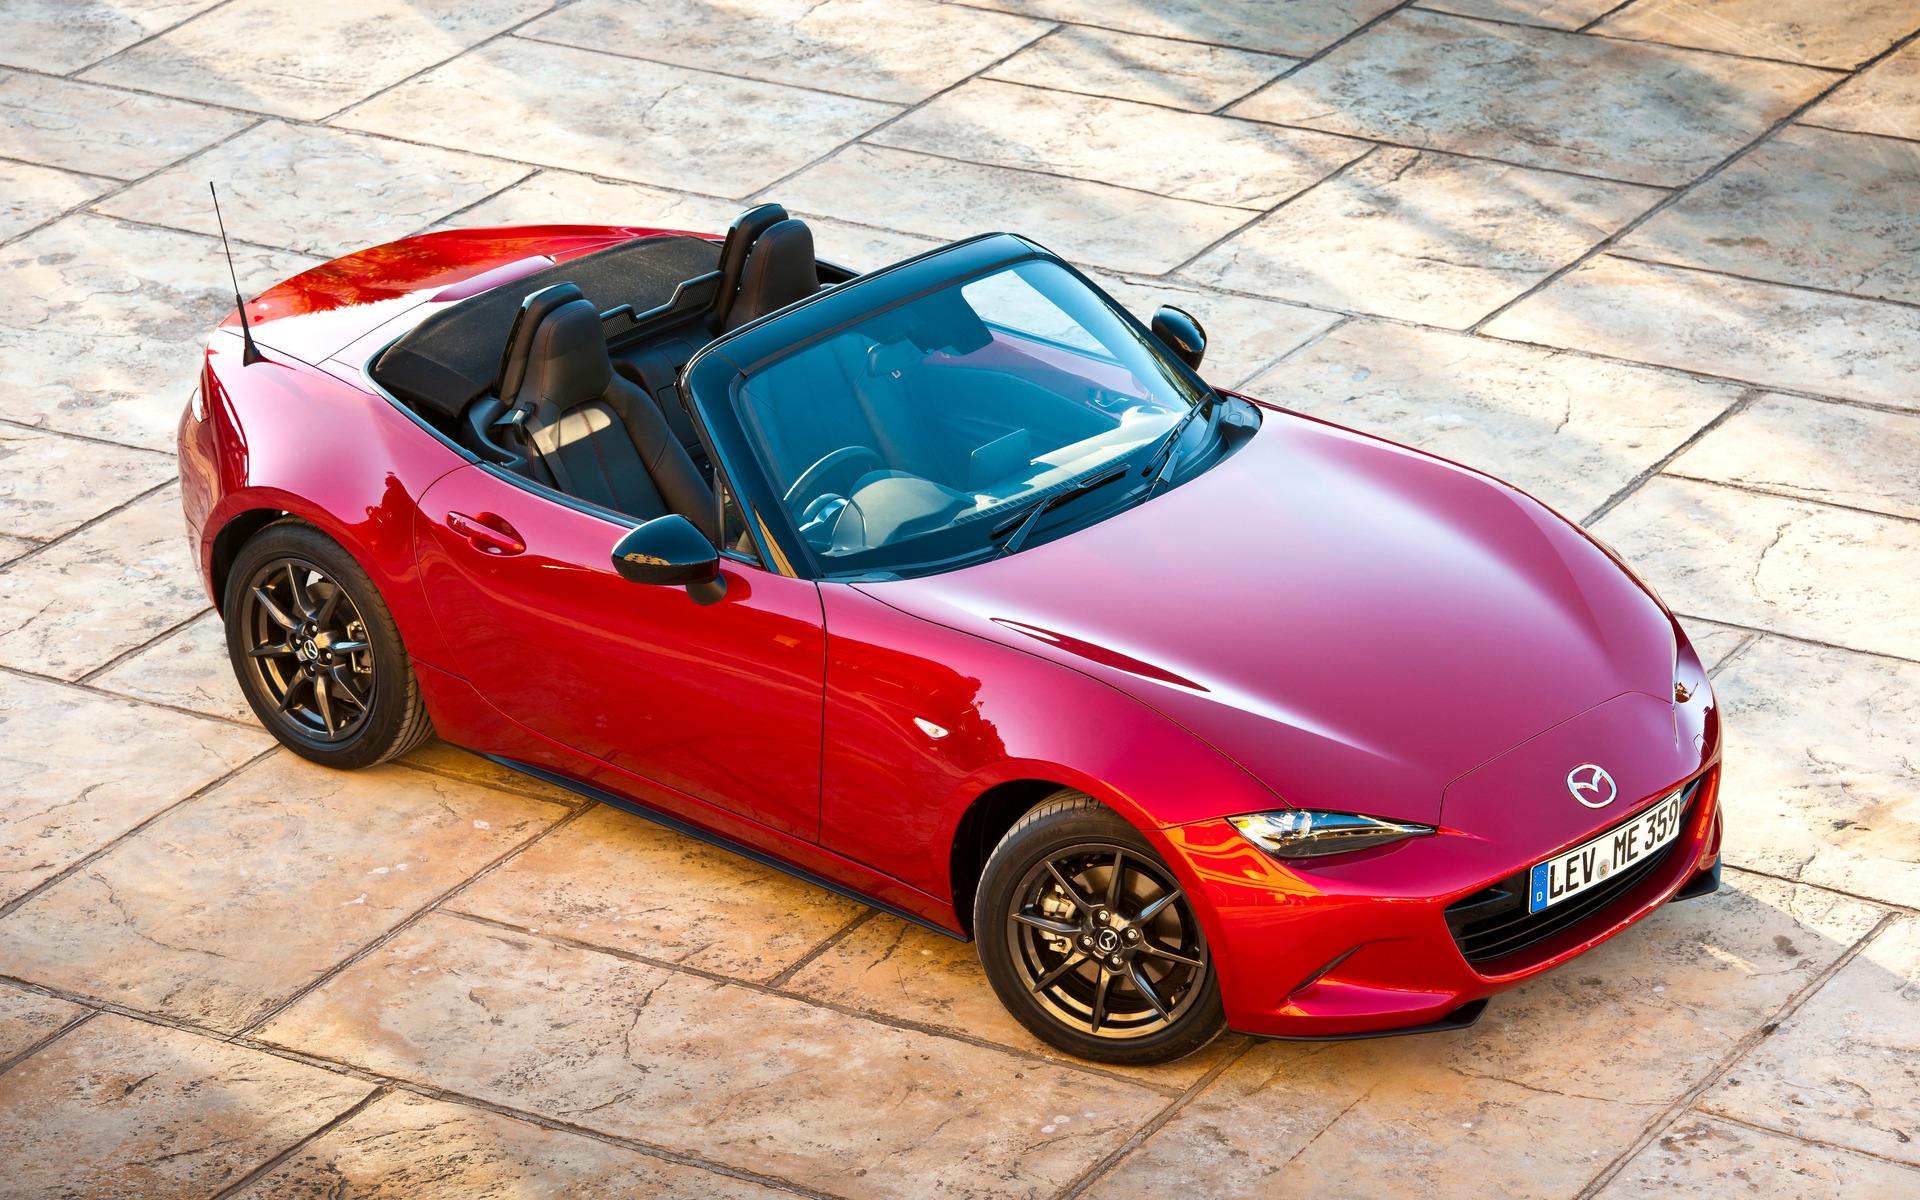 https://i.gaw.to/photos/1/8/4/184160_2016_Mazda_MX-5.jpg